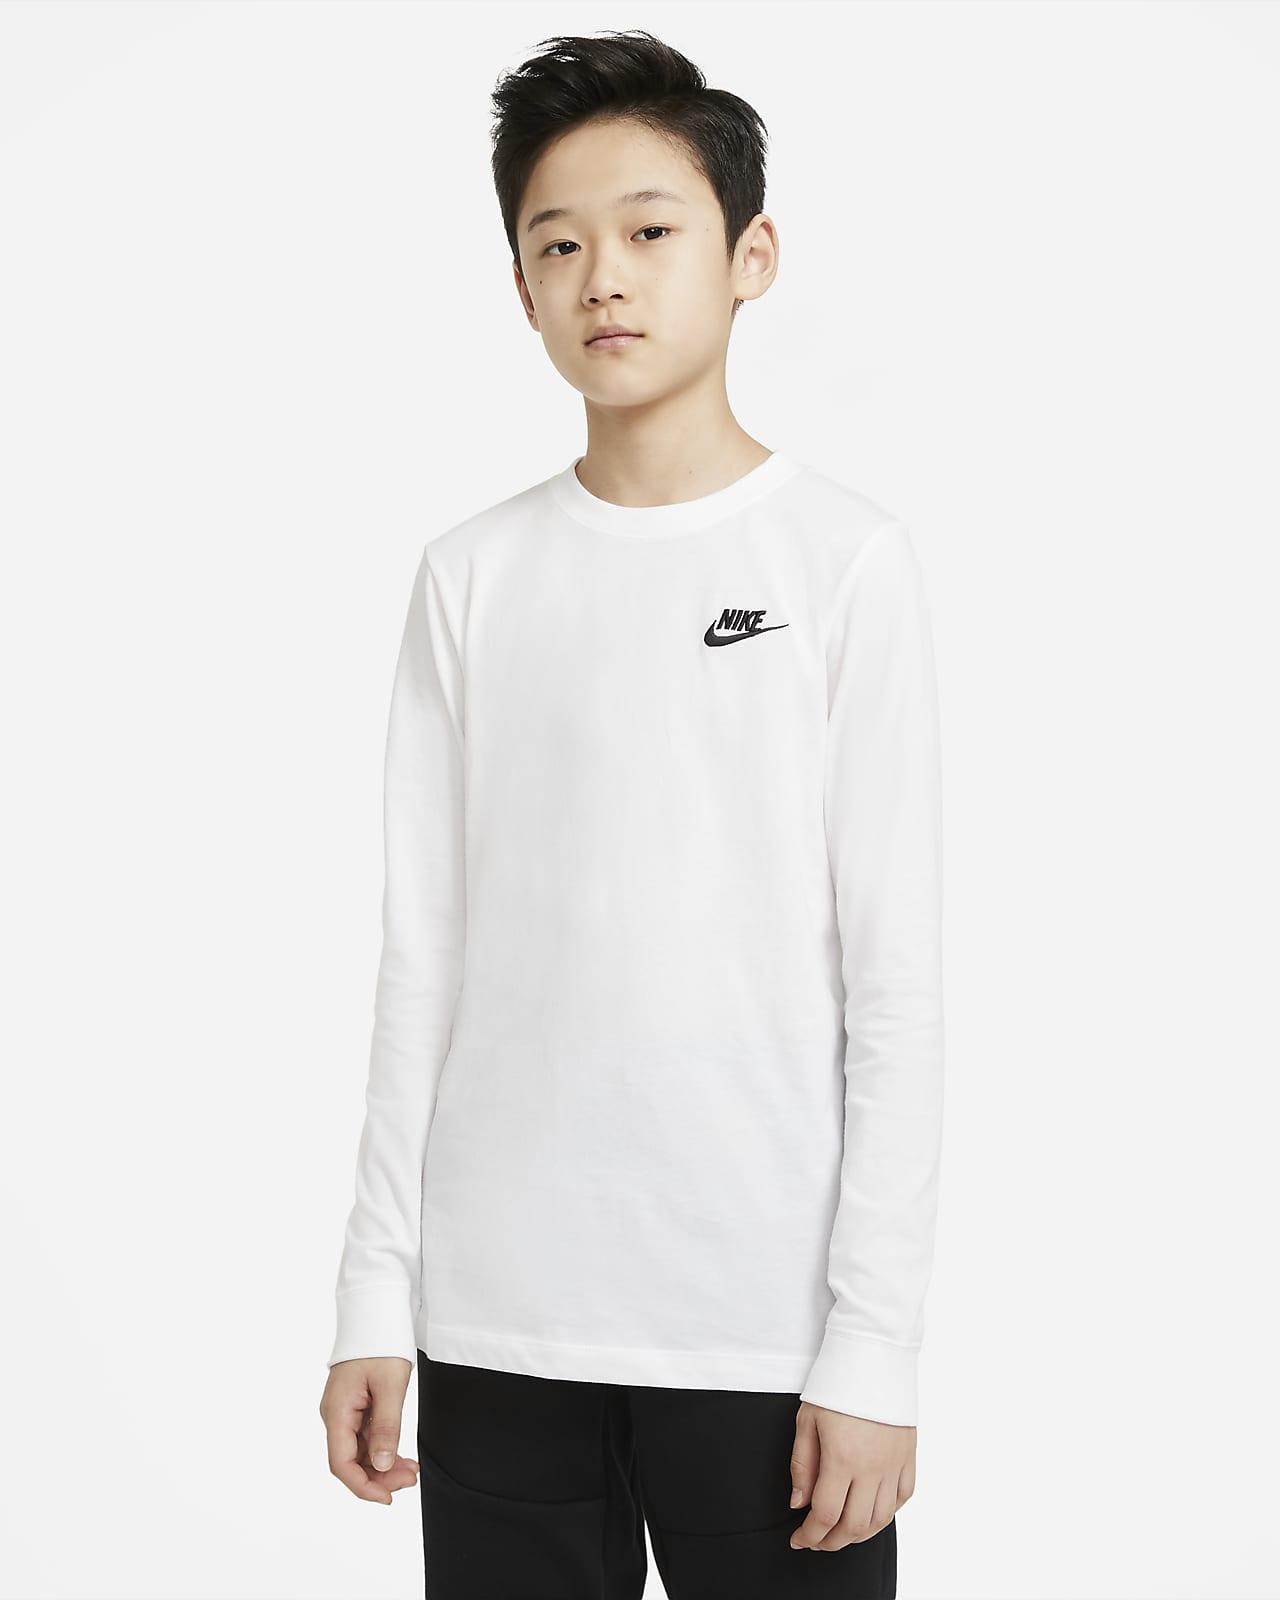 Camisola de manga comprida Nike Sportswear Júnior (Rapaz)